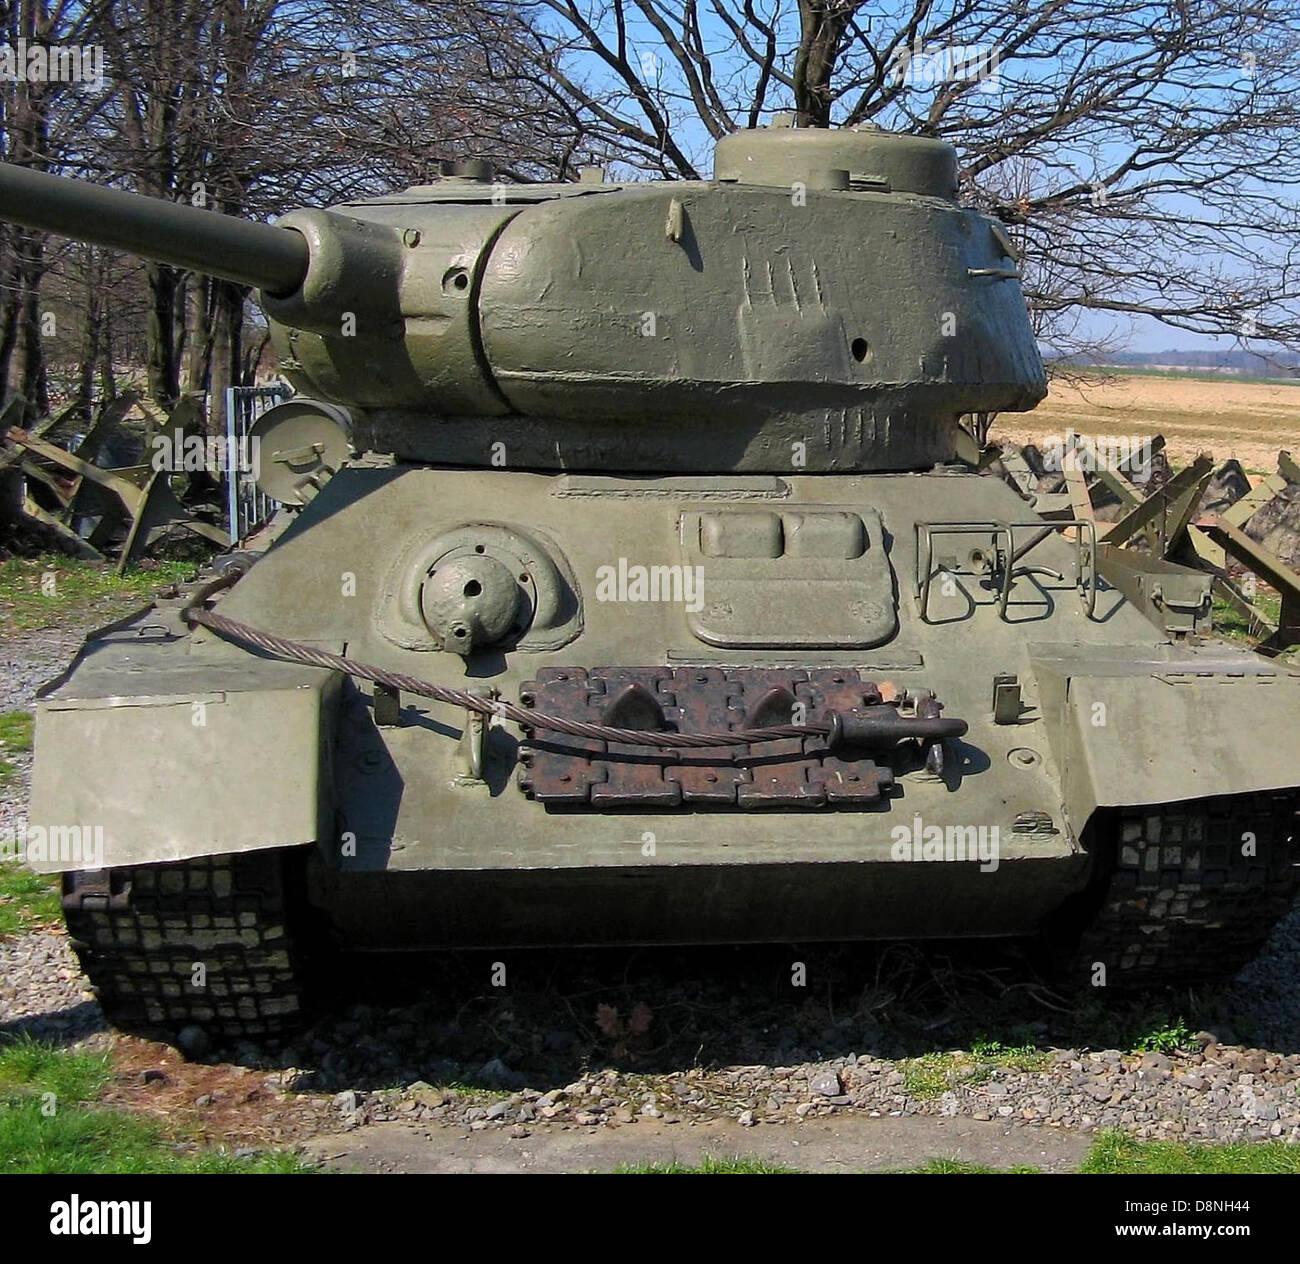 World war two tank. - Stock Image